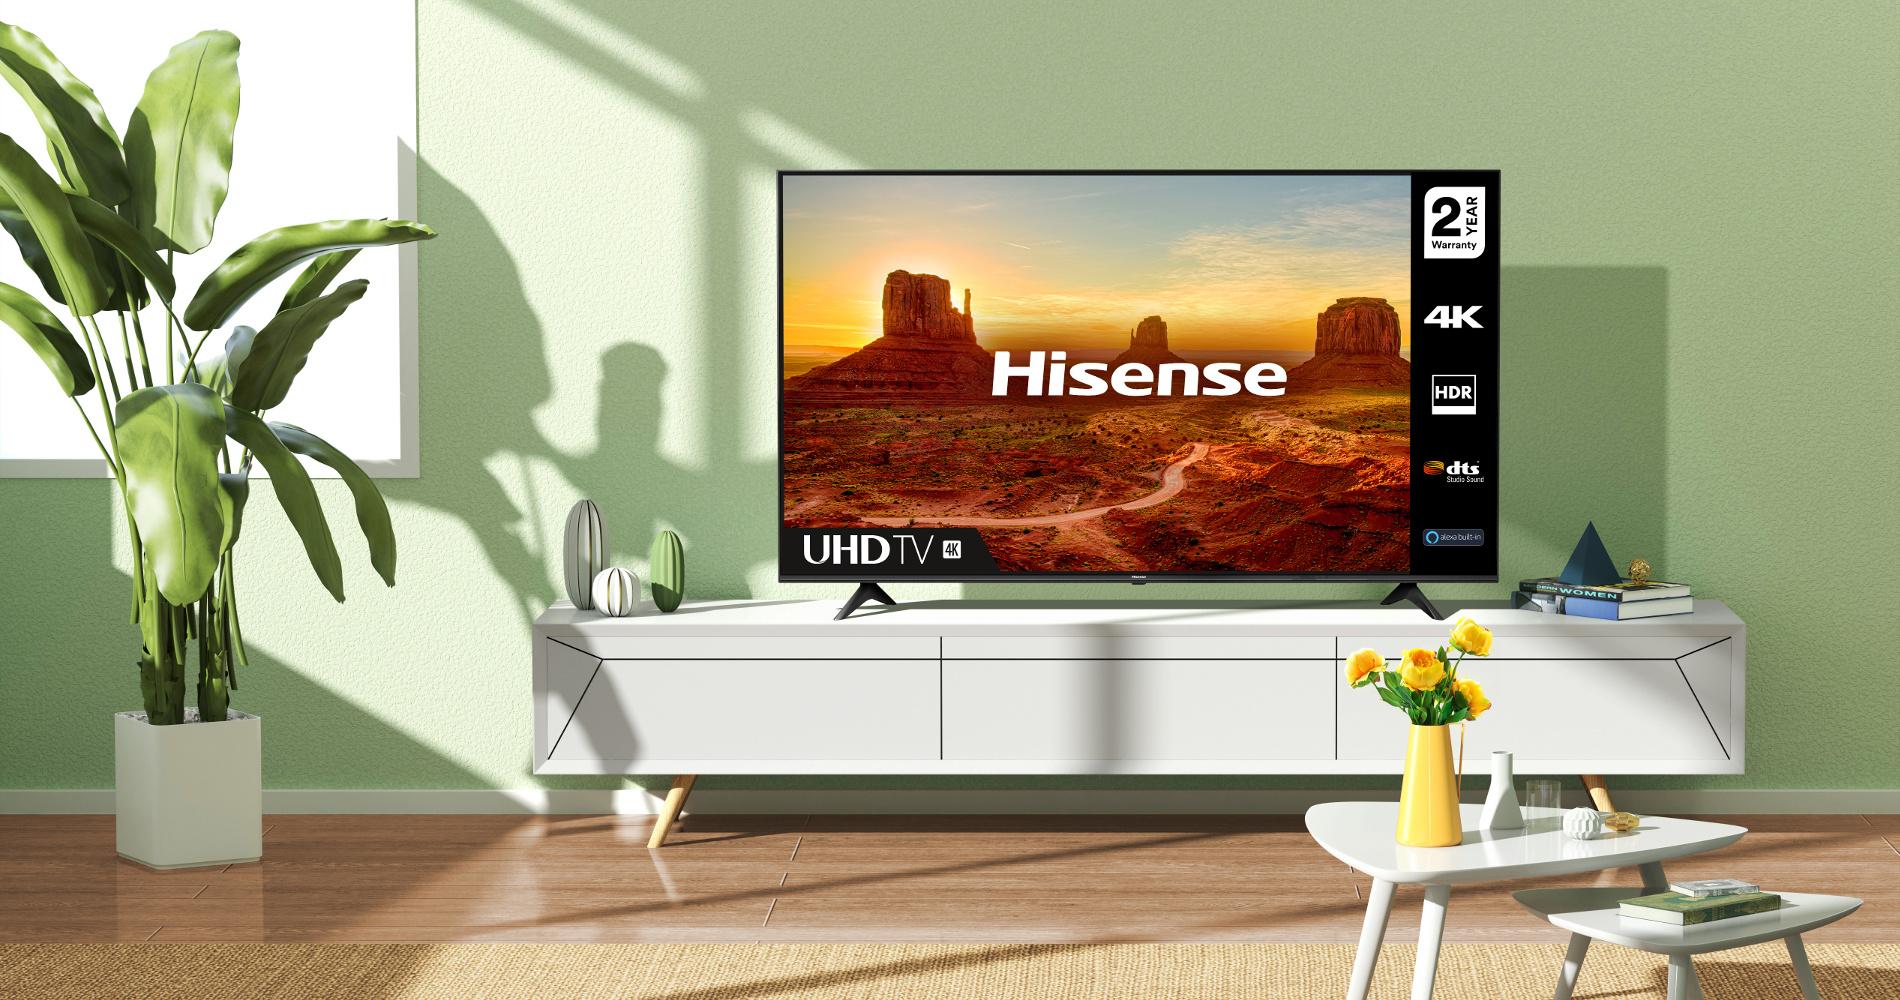 Hisense 4K UHD A7 TV